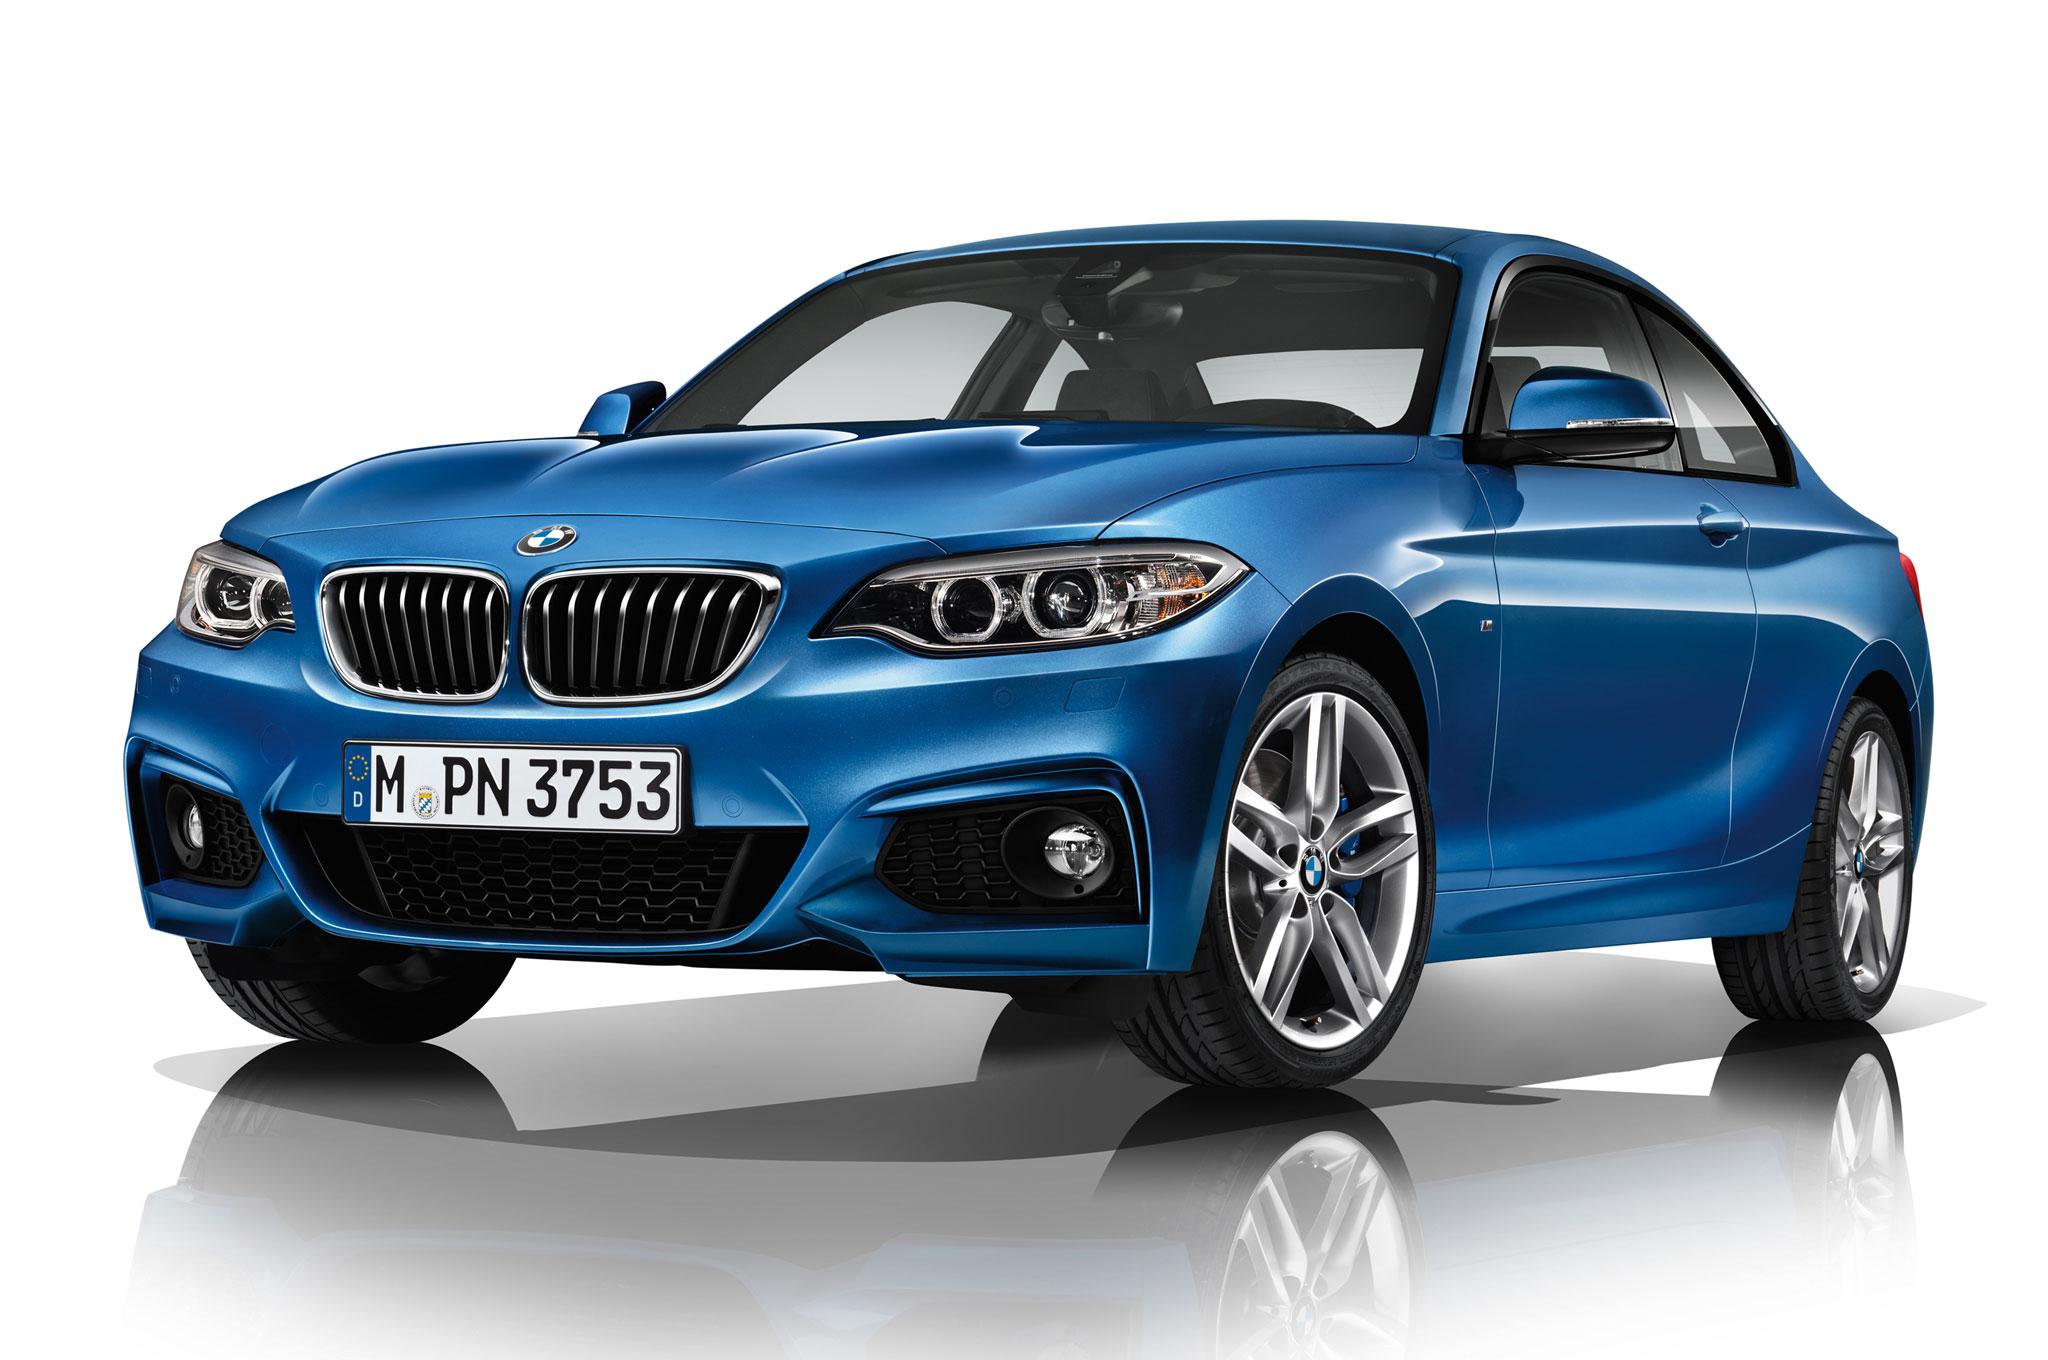 2014 BMW 2 Series Coupe Configurator Goes Live - Automobile Magazine